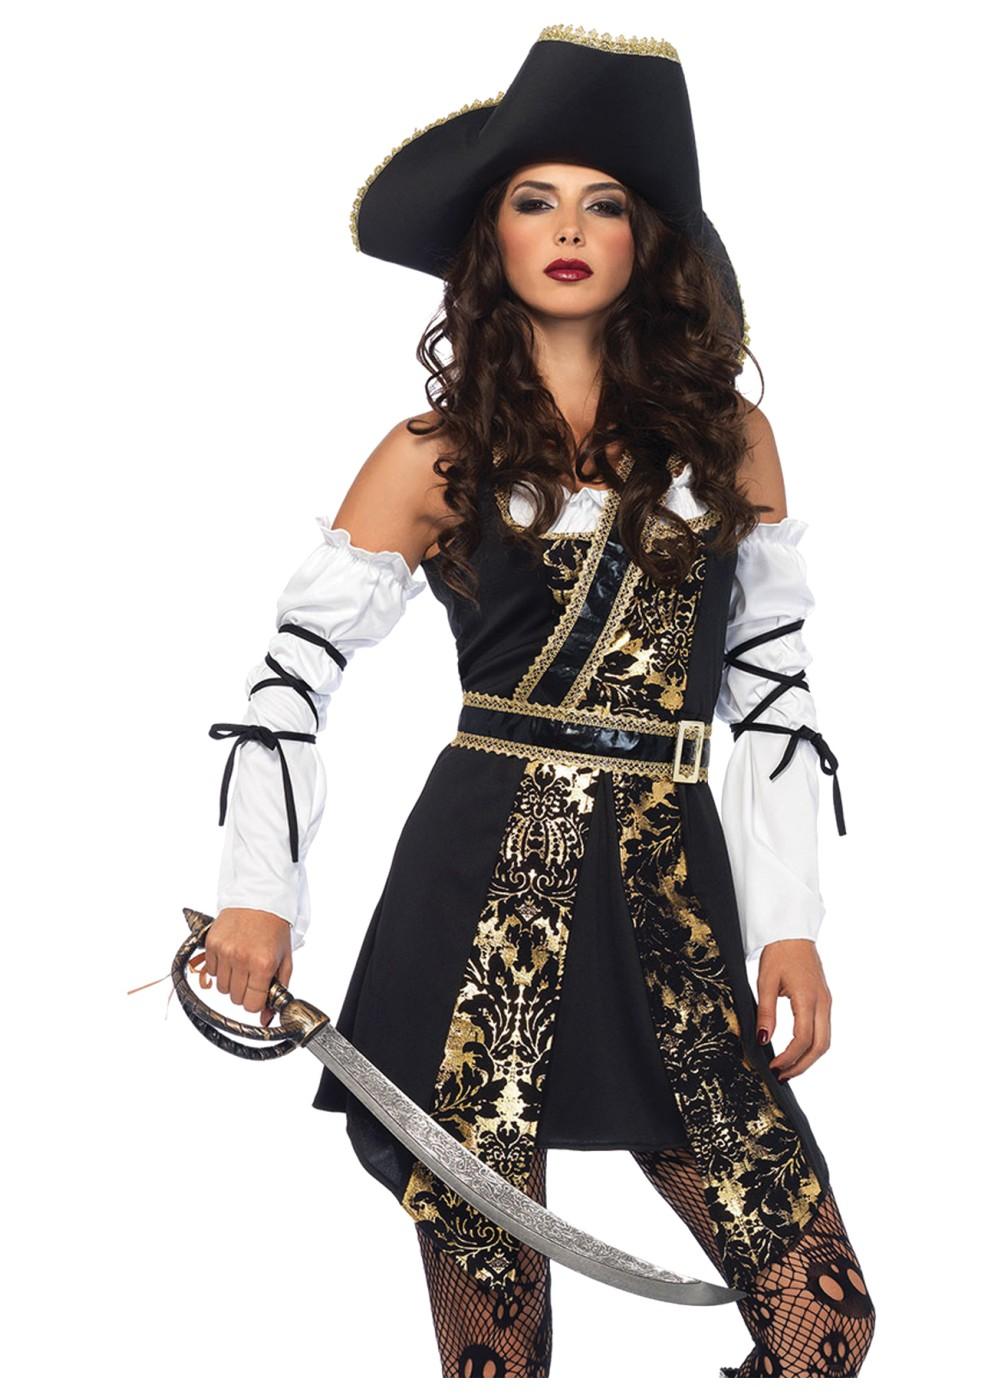 Buccaneer Pirate Women Costume Pirate Costumes